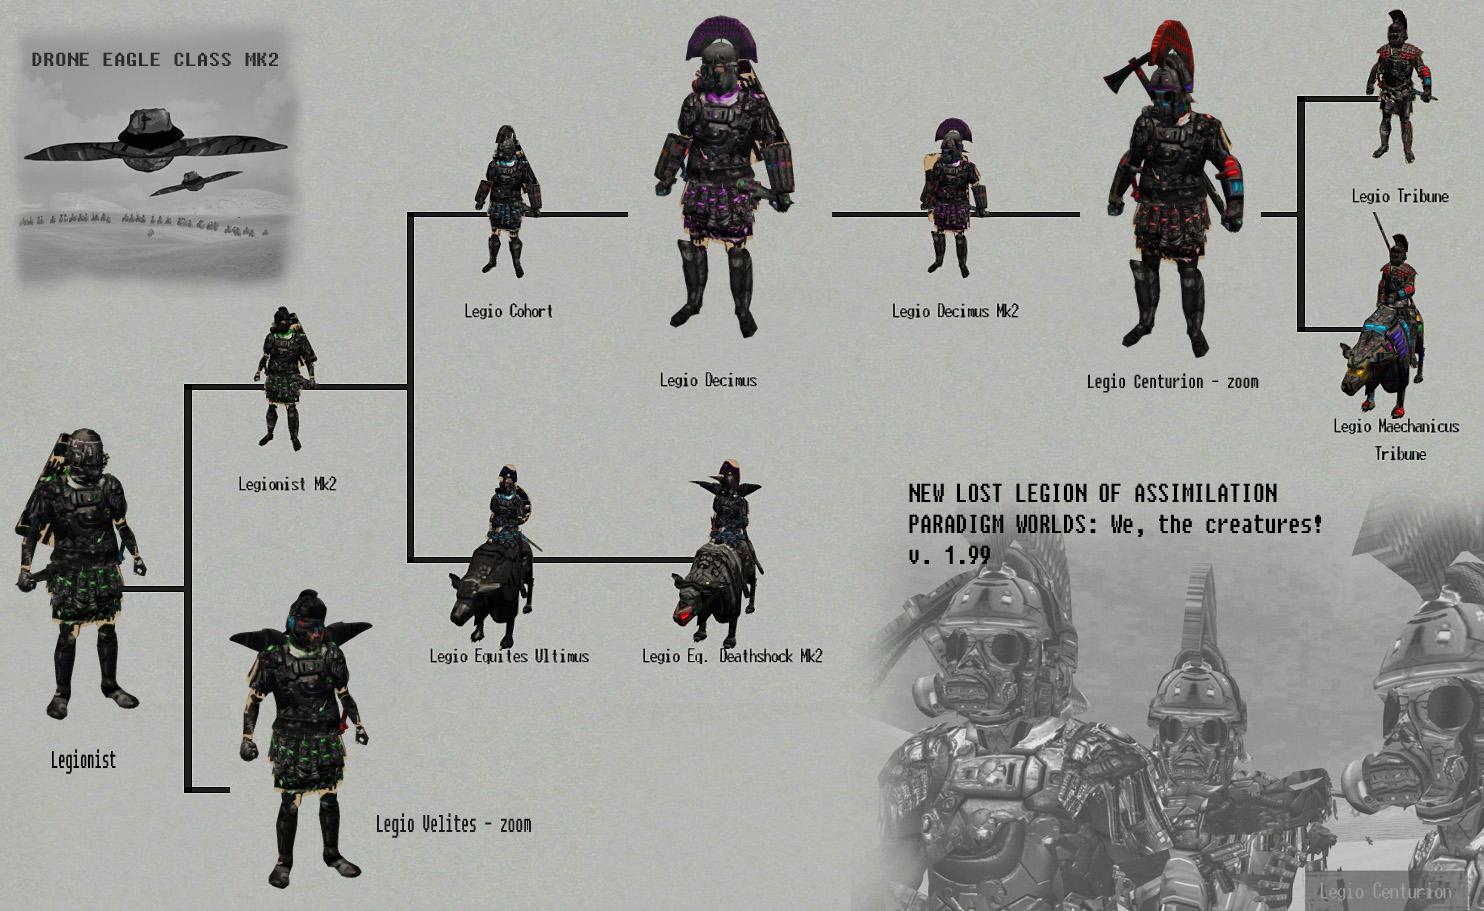 New Lost Legion of Assimilation - PARADIGM WORLDS